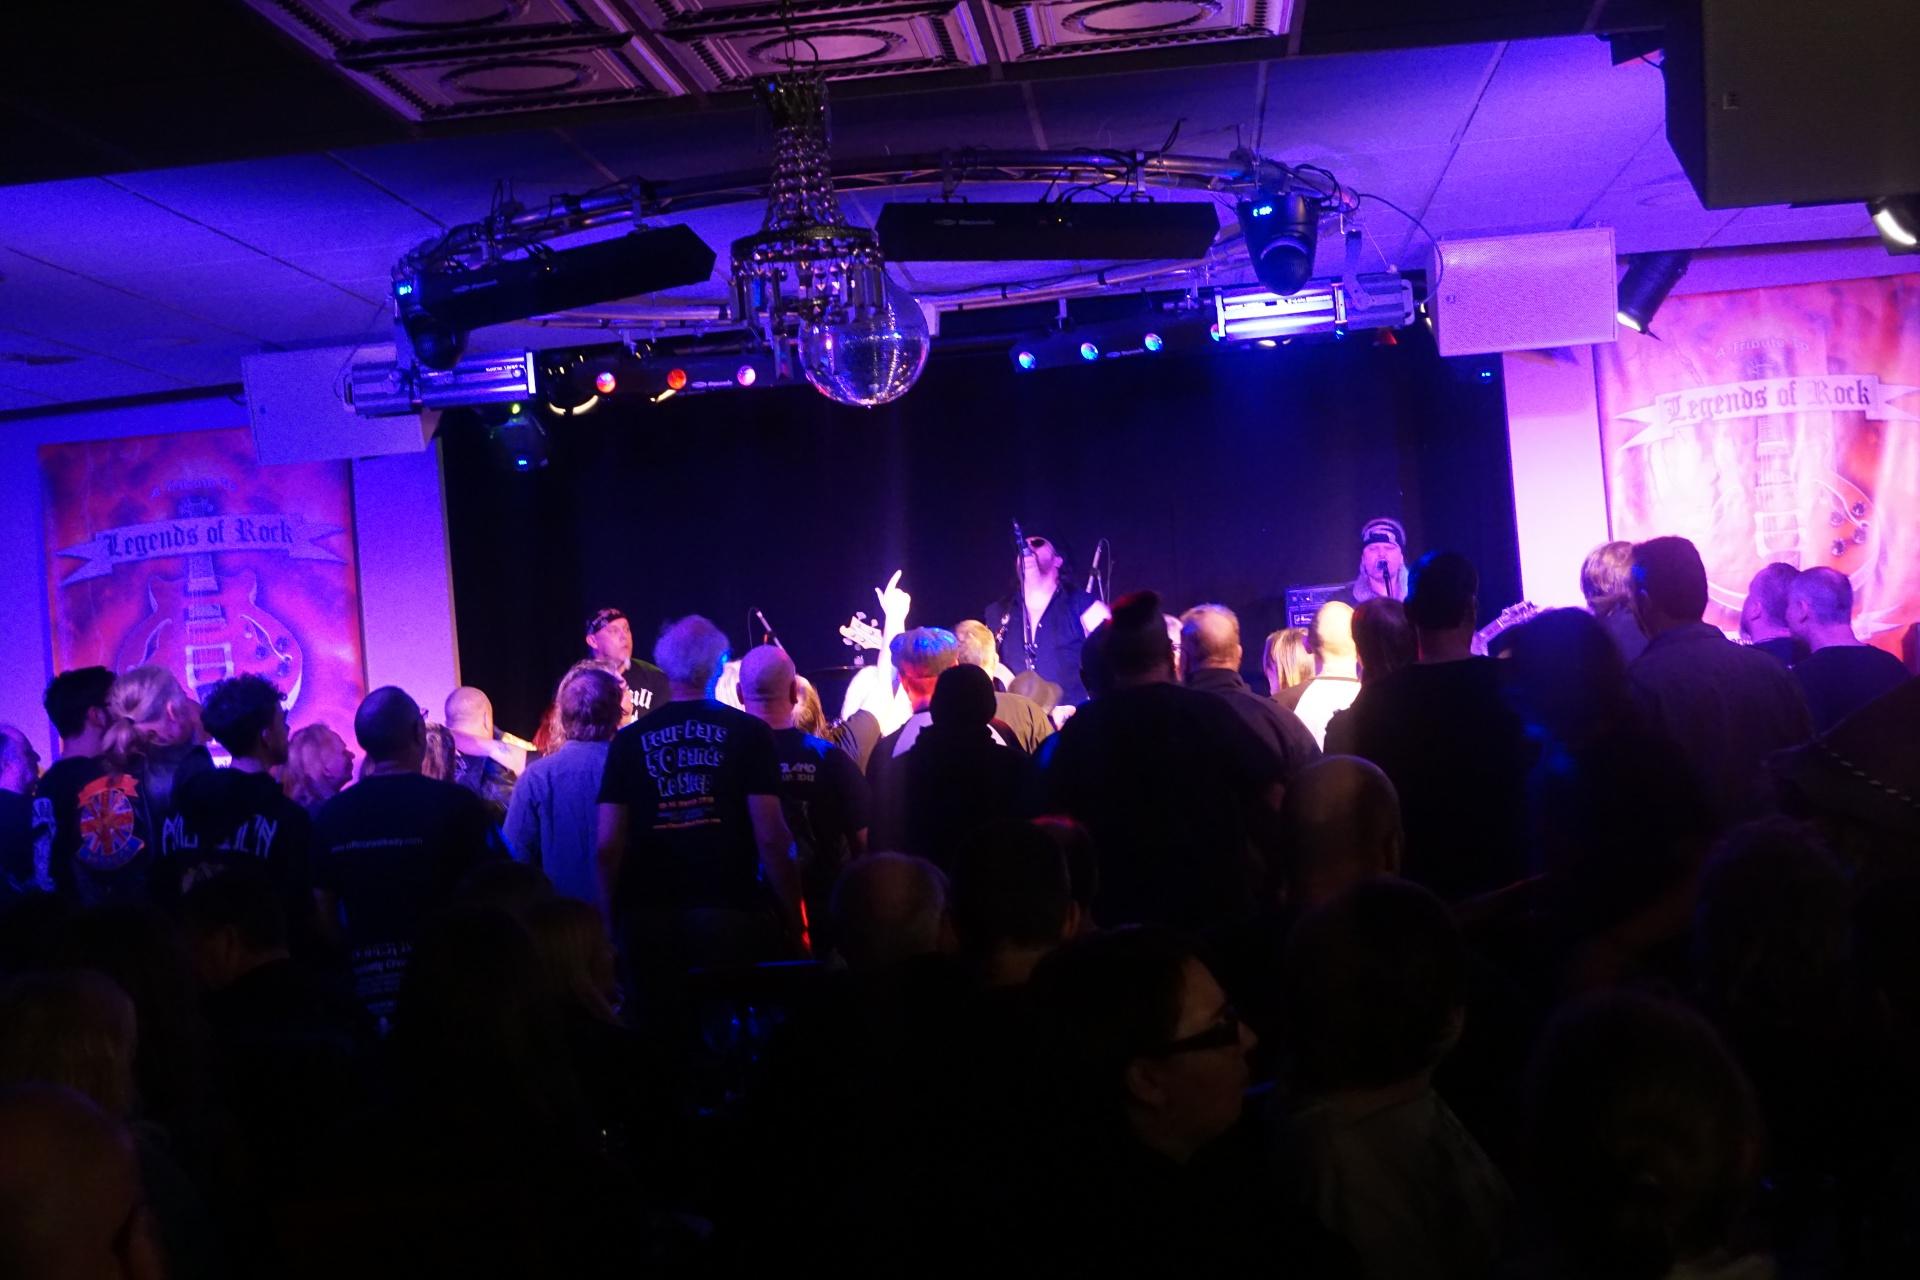 Hastings gig - Great Crowd